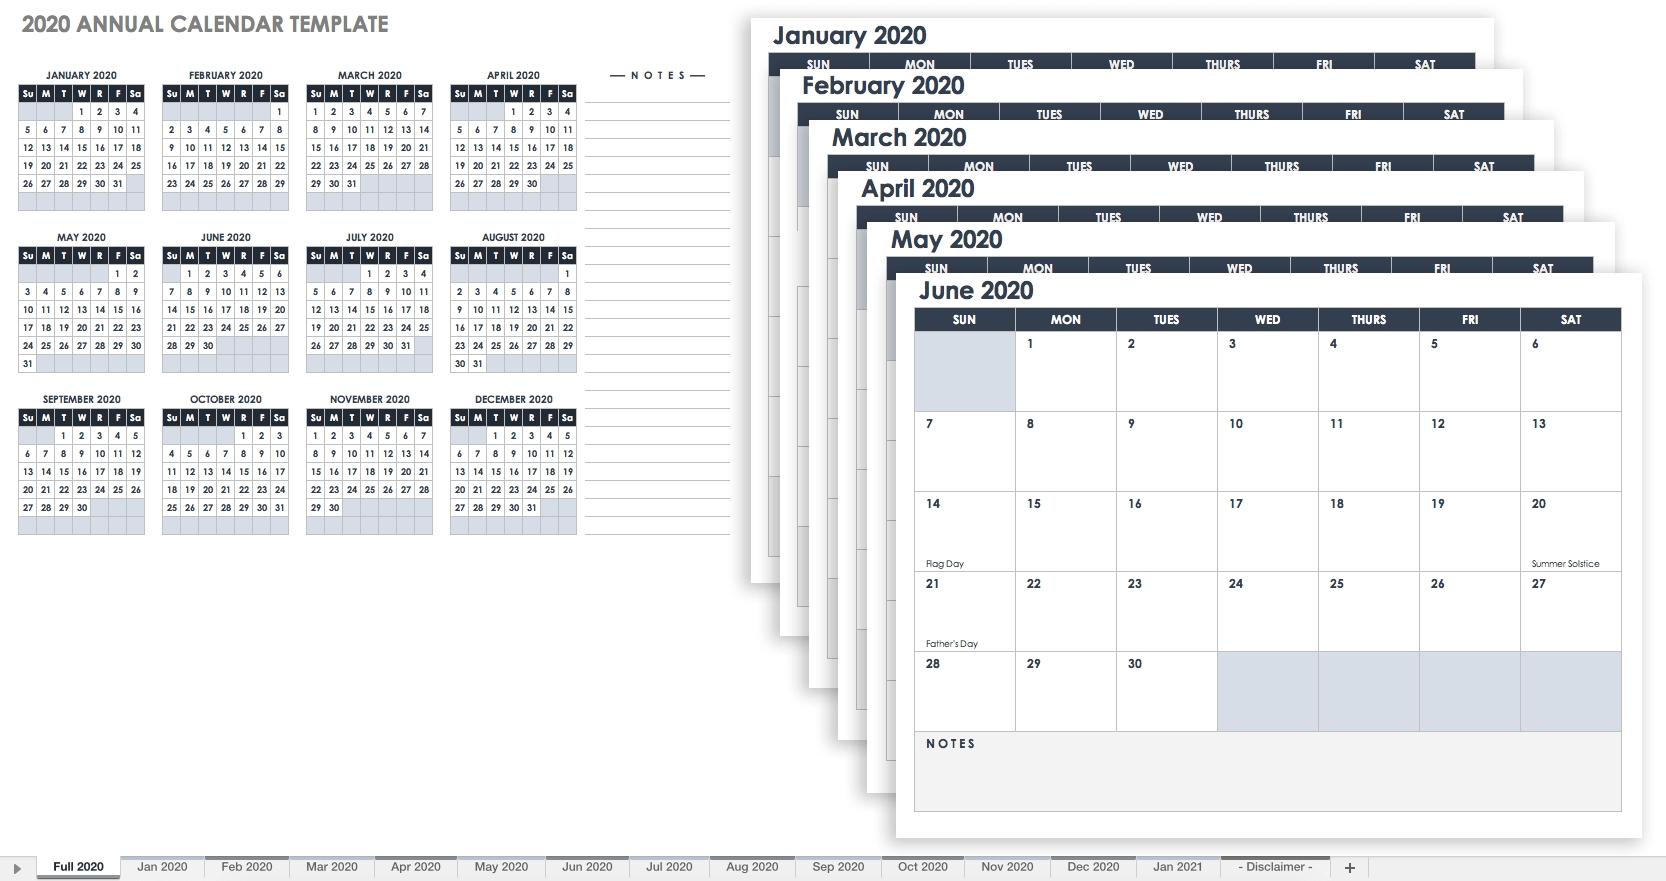 Free Blank Calendar Templates - Smartsheet-6 Month Calendar Template 2020